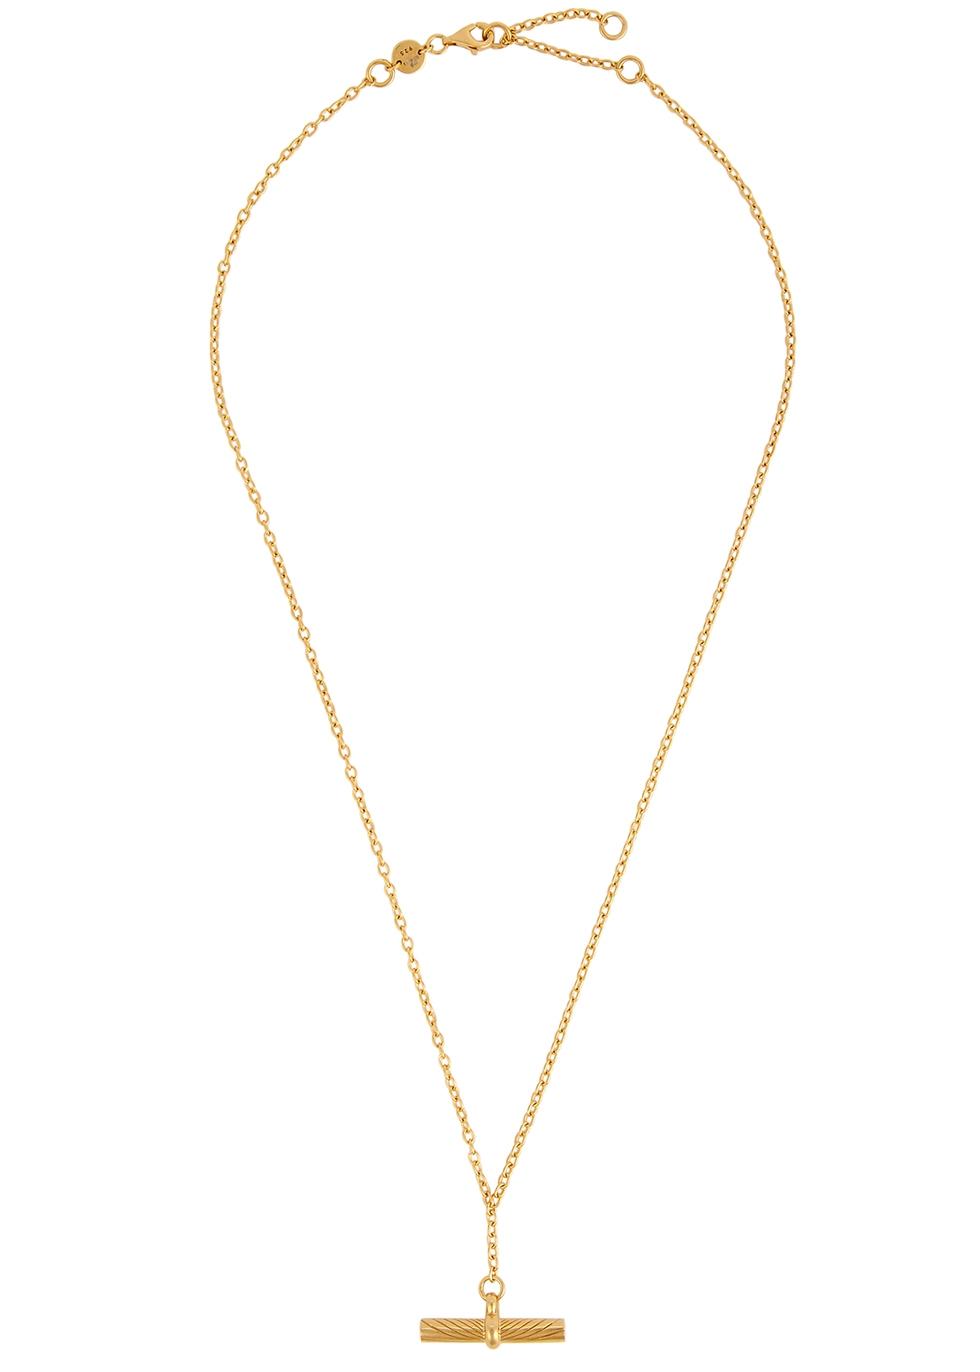 X Estée Lalonde 18kt gold-plated necklace